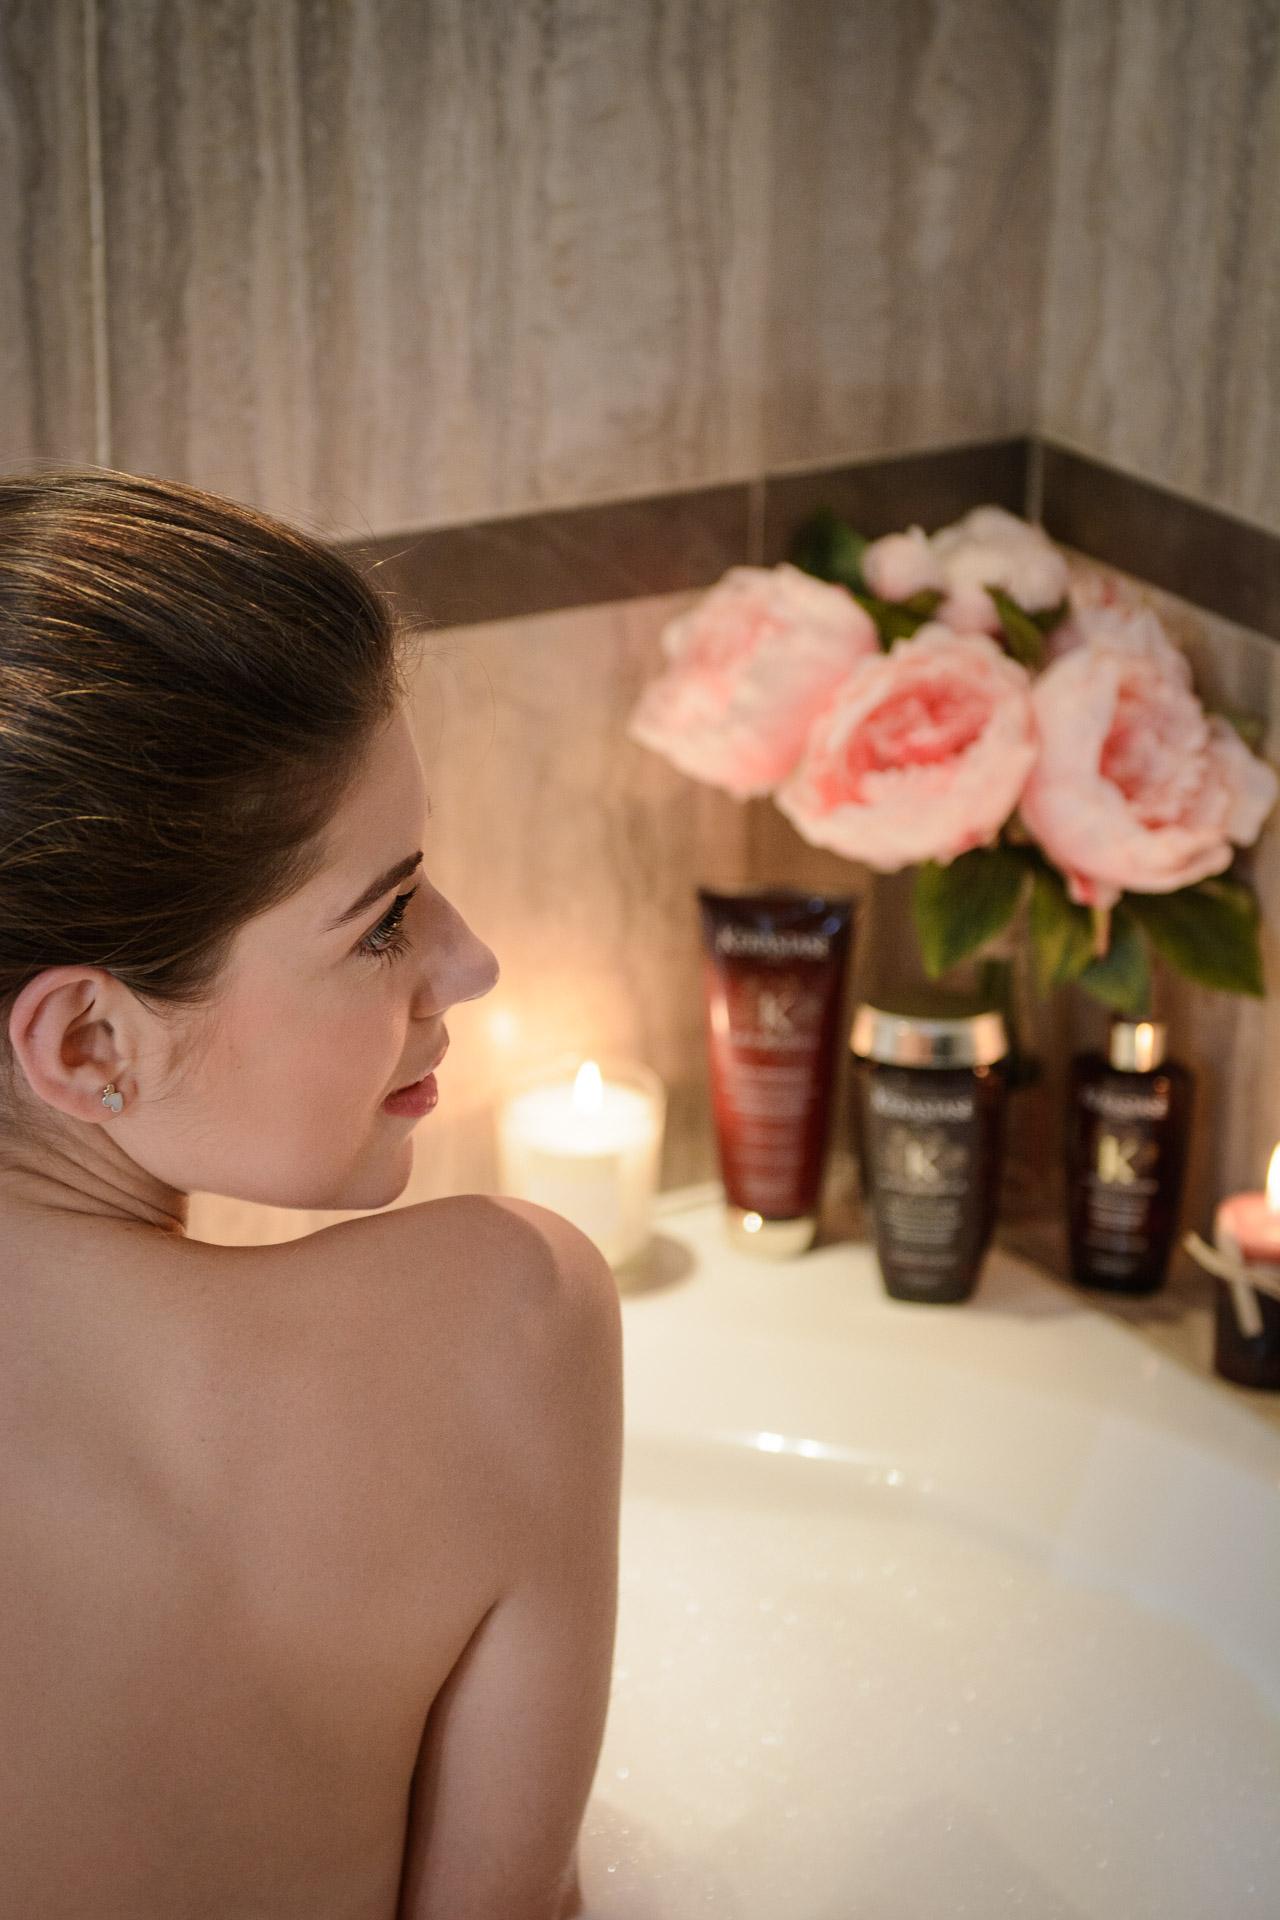 Kerastase aura botanica beauty blogger